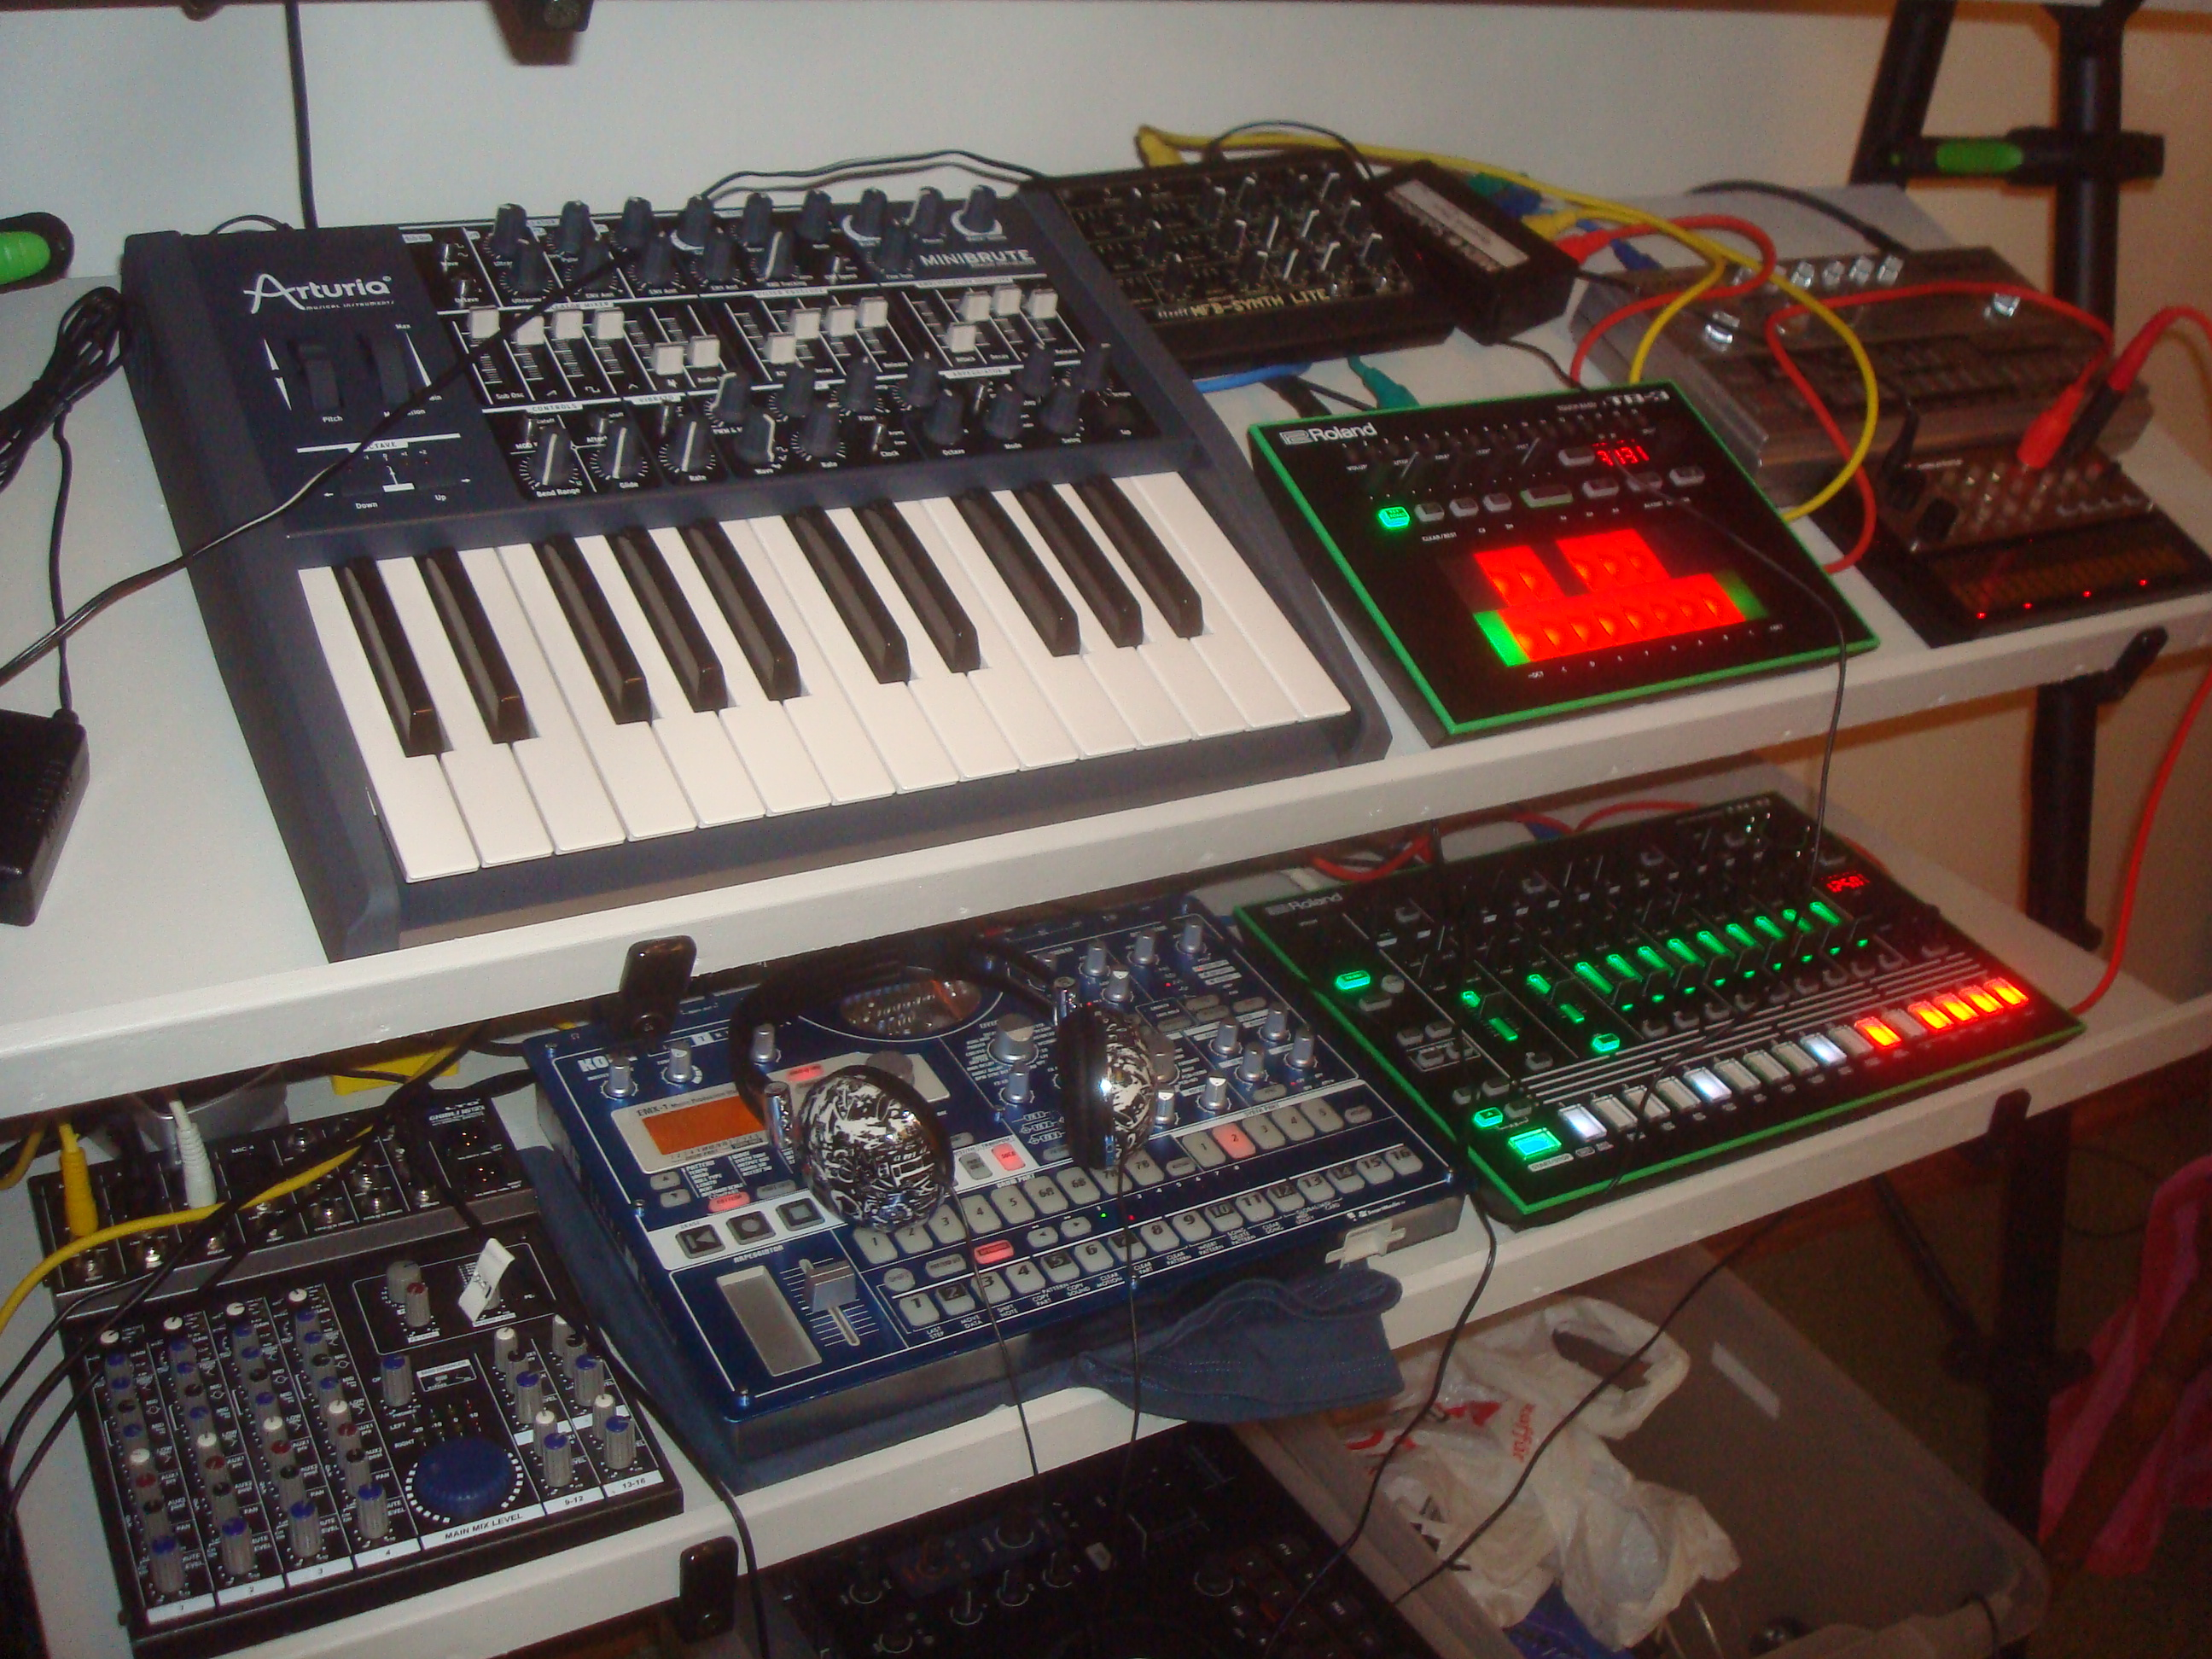 File:Minibrute & friends - MFB-Synth Lite, Roland AIRA TB-3 Touch Bass ...